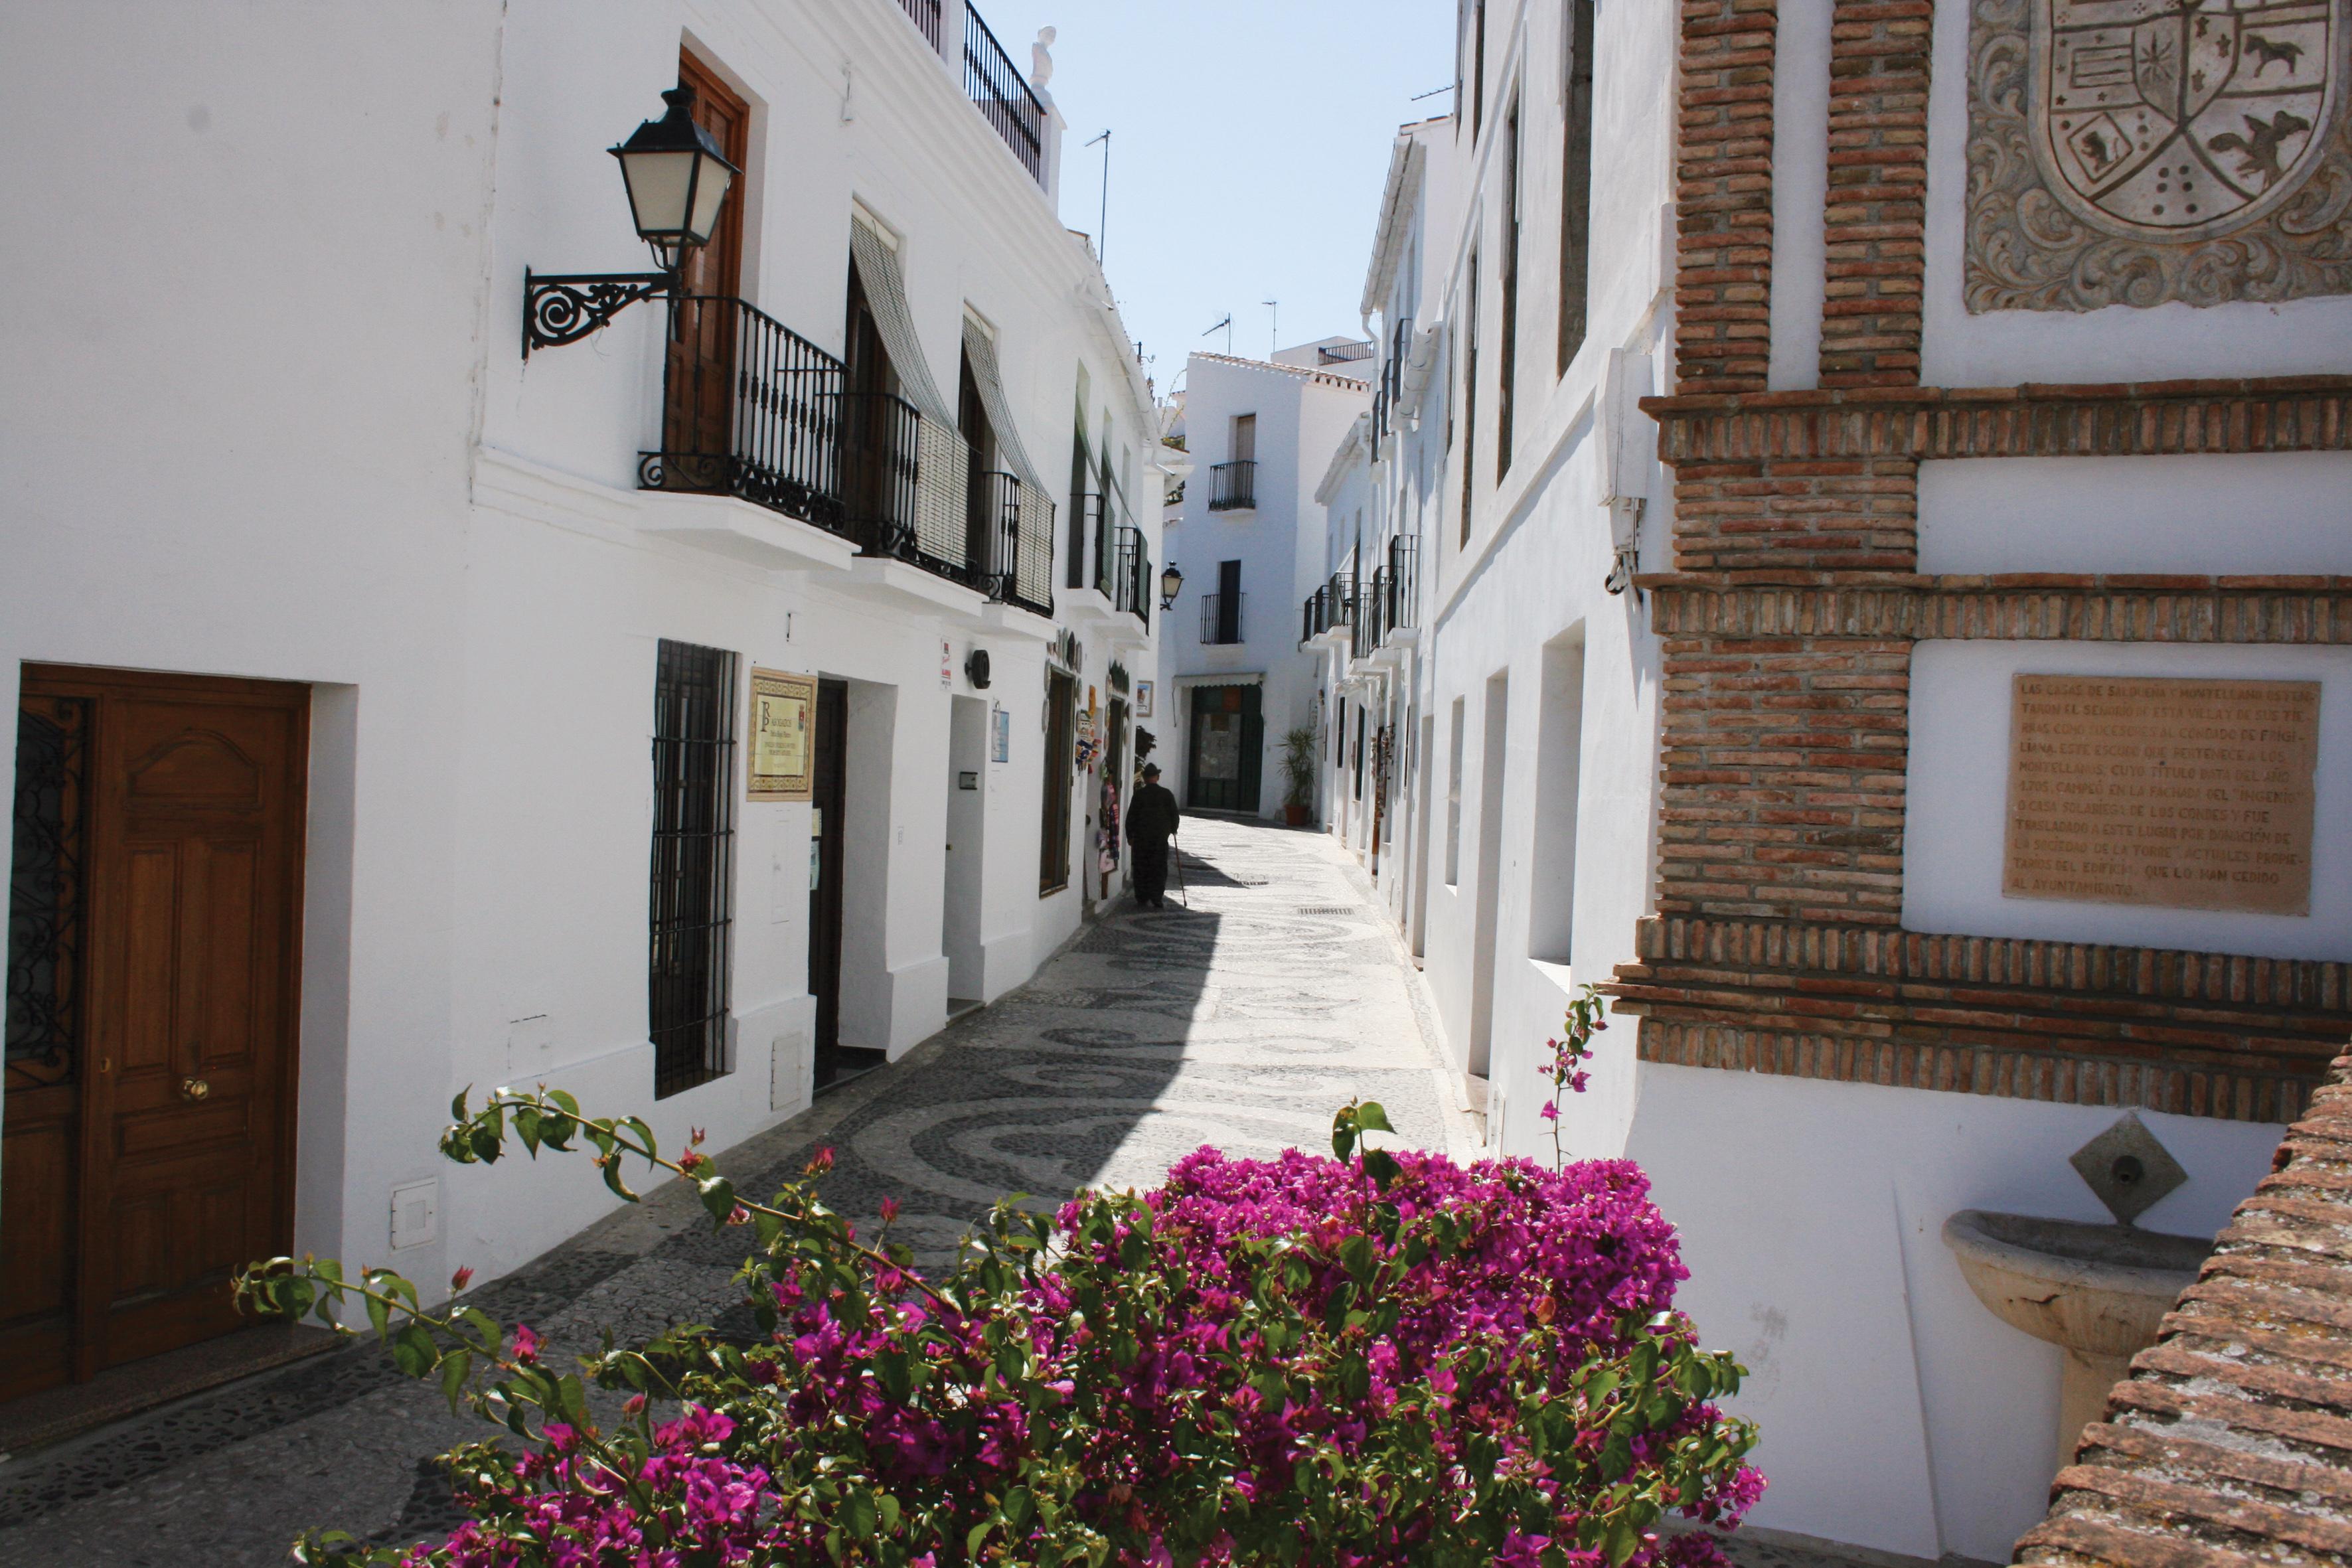 Summer Program - Spanish | EF Spanish Language Camp in Malaga, Spain (Age 13-15)